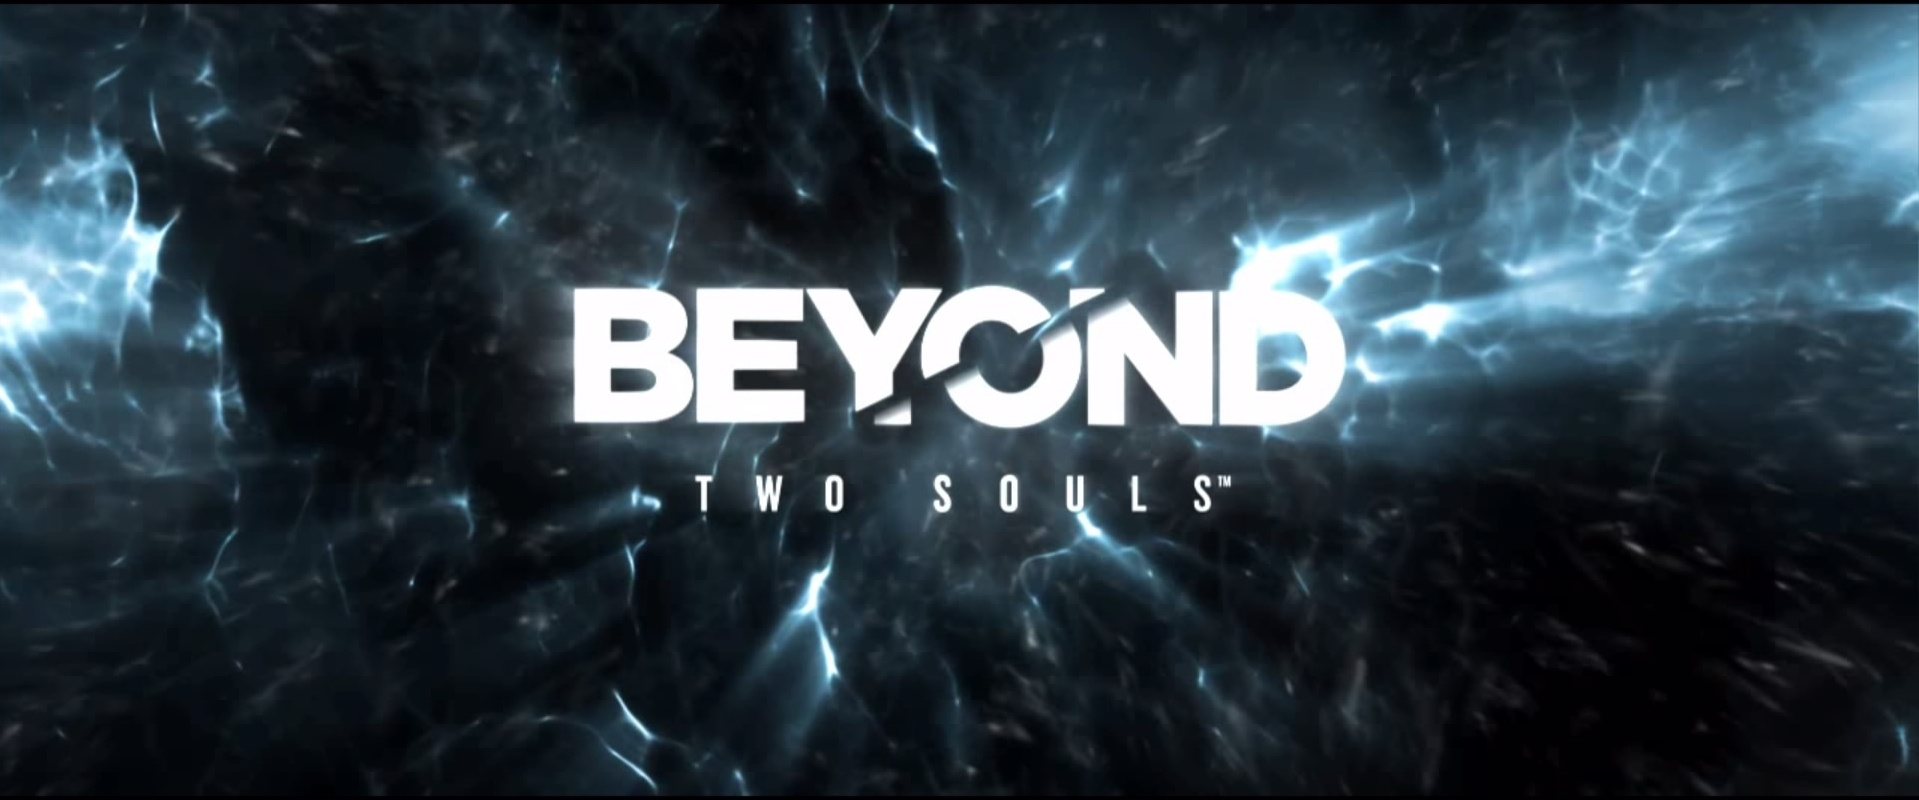 Beyond_ Two Souls™_20160312221509.jpg